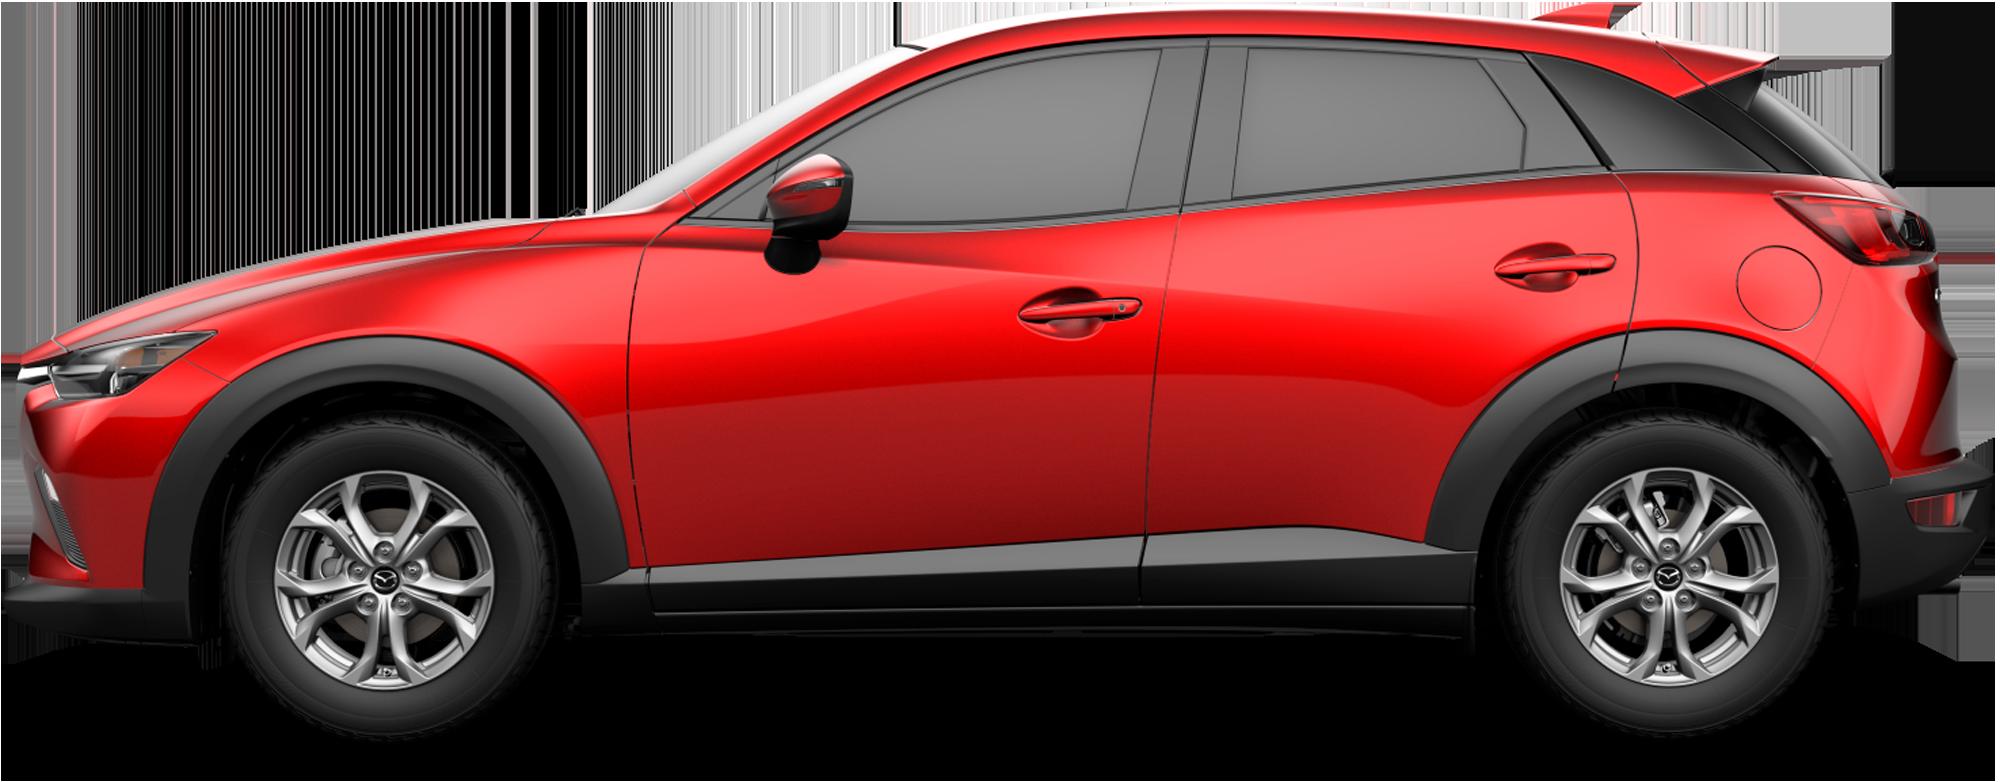 2020 Mazda Mazda CX-3 SUV Sport